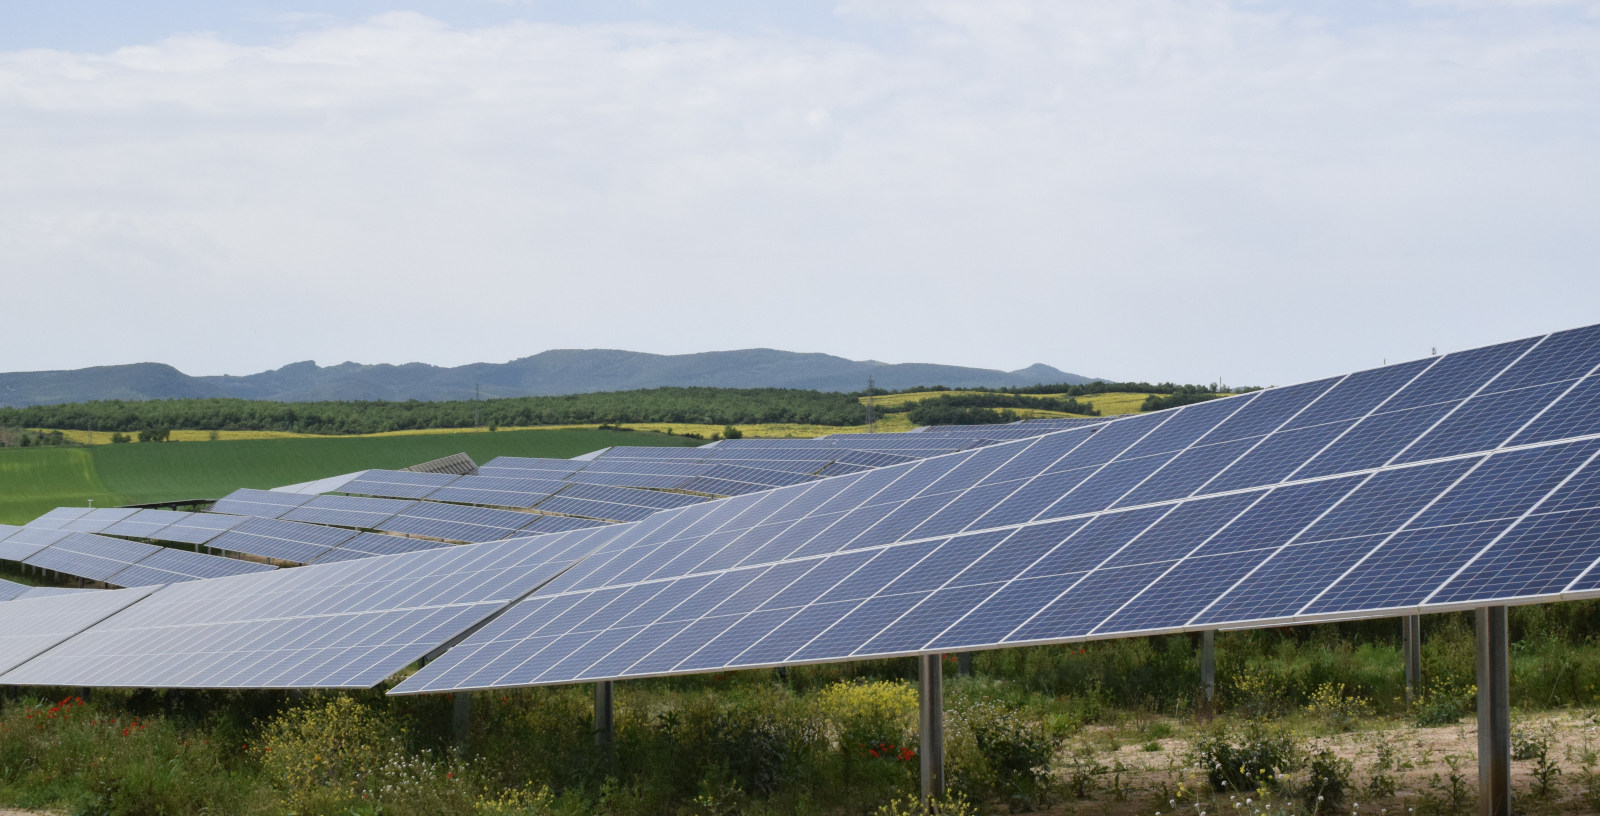 EKIAN_Fotovoltaic_Park_Basque_Country_Spain_IDOM_001